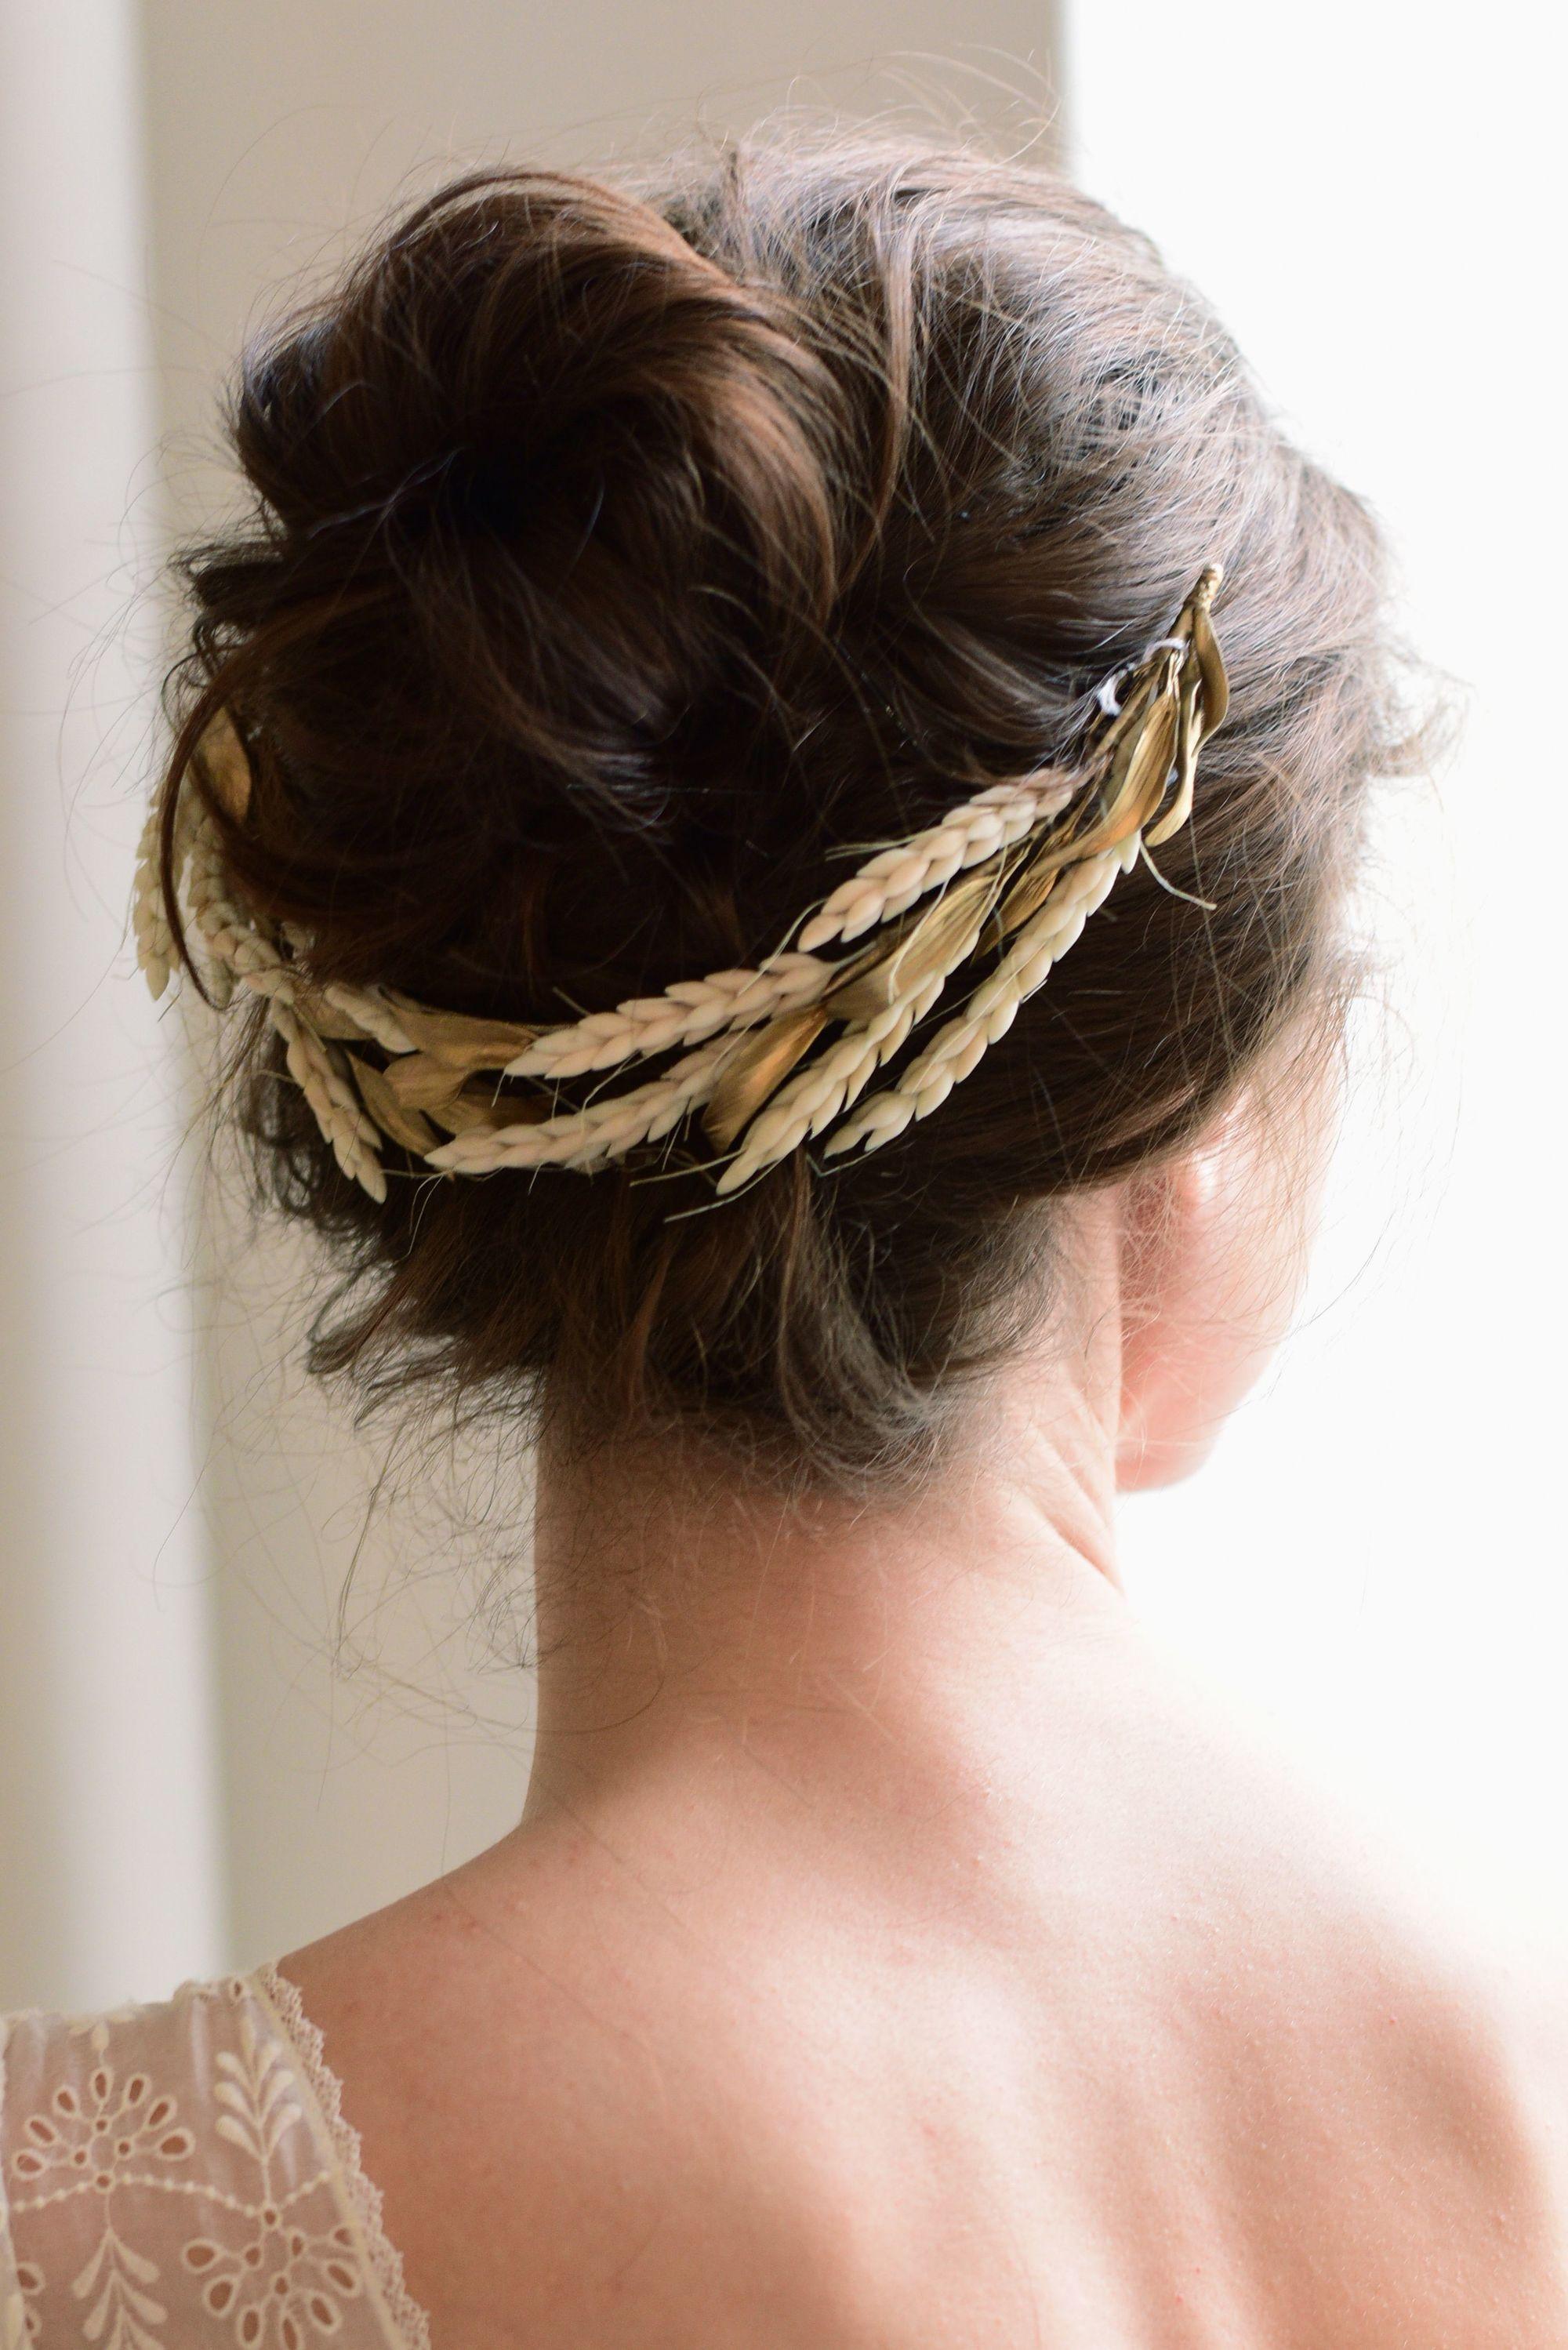 accesorios para novias peinado recogido